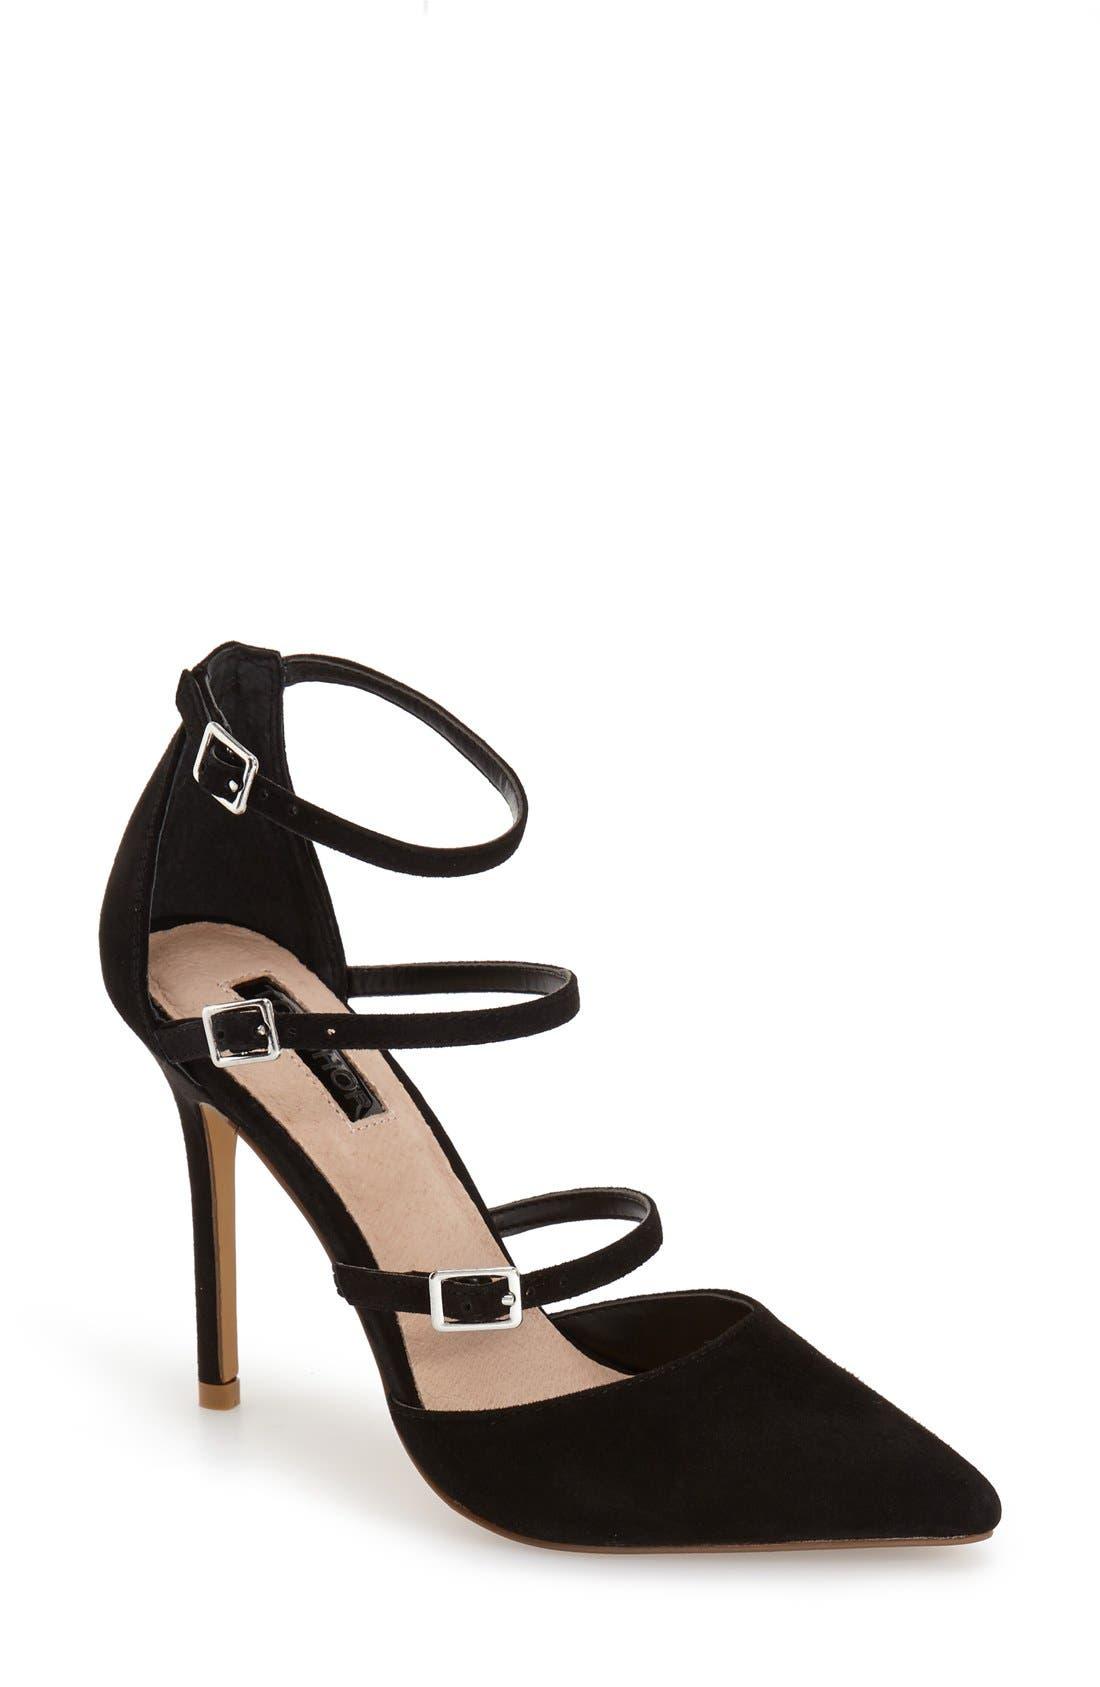 Main Image - Topshop 'Giselle' Buckle Sandal (Women)